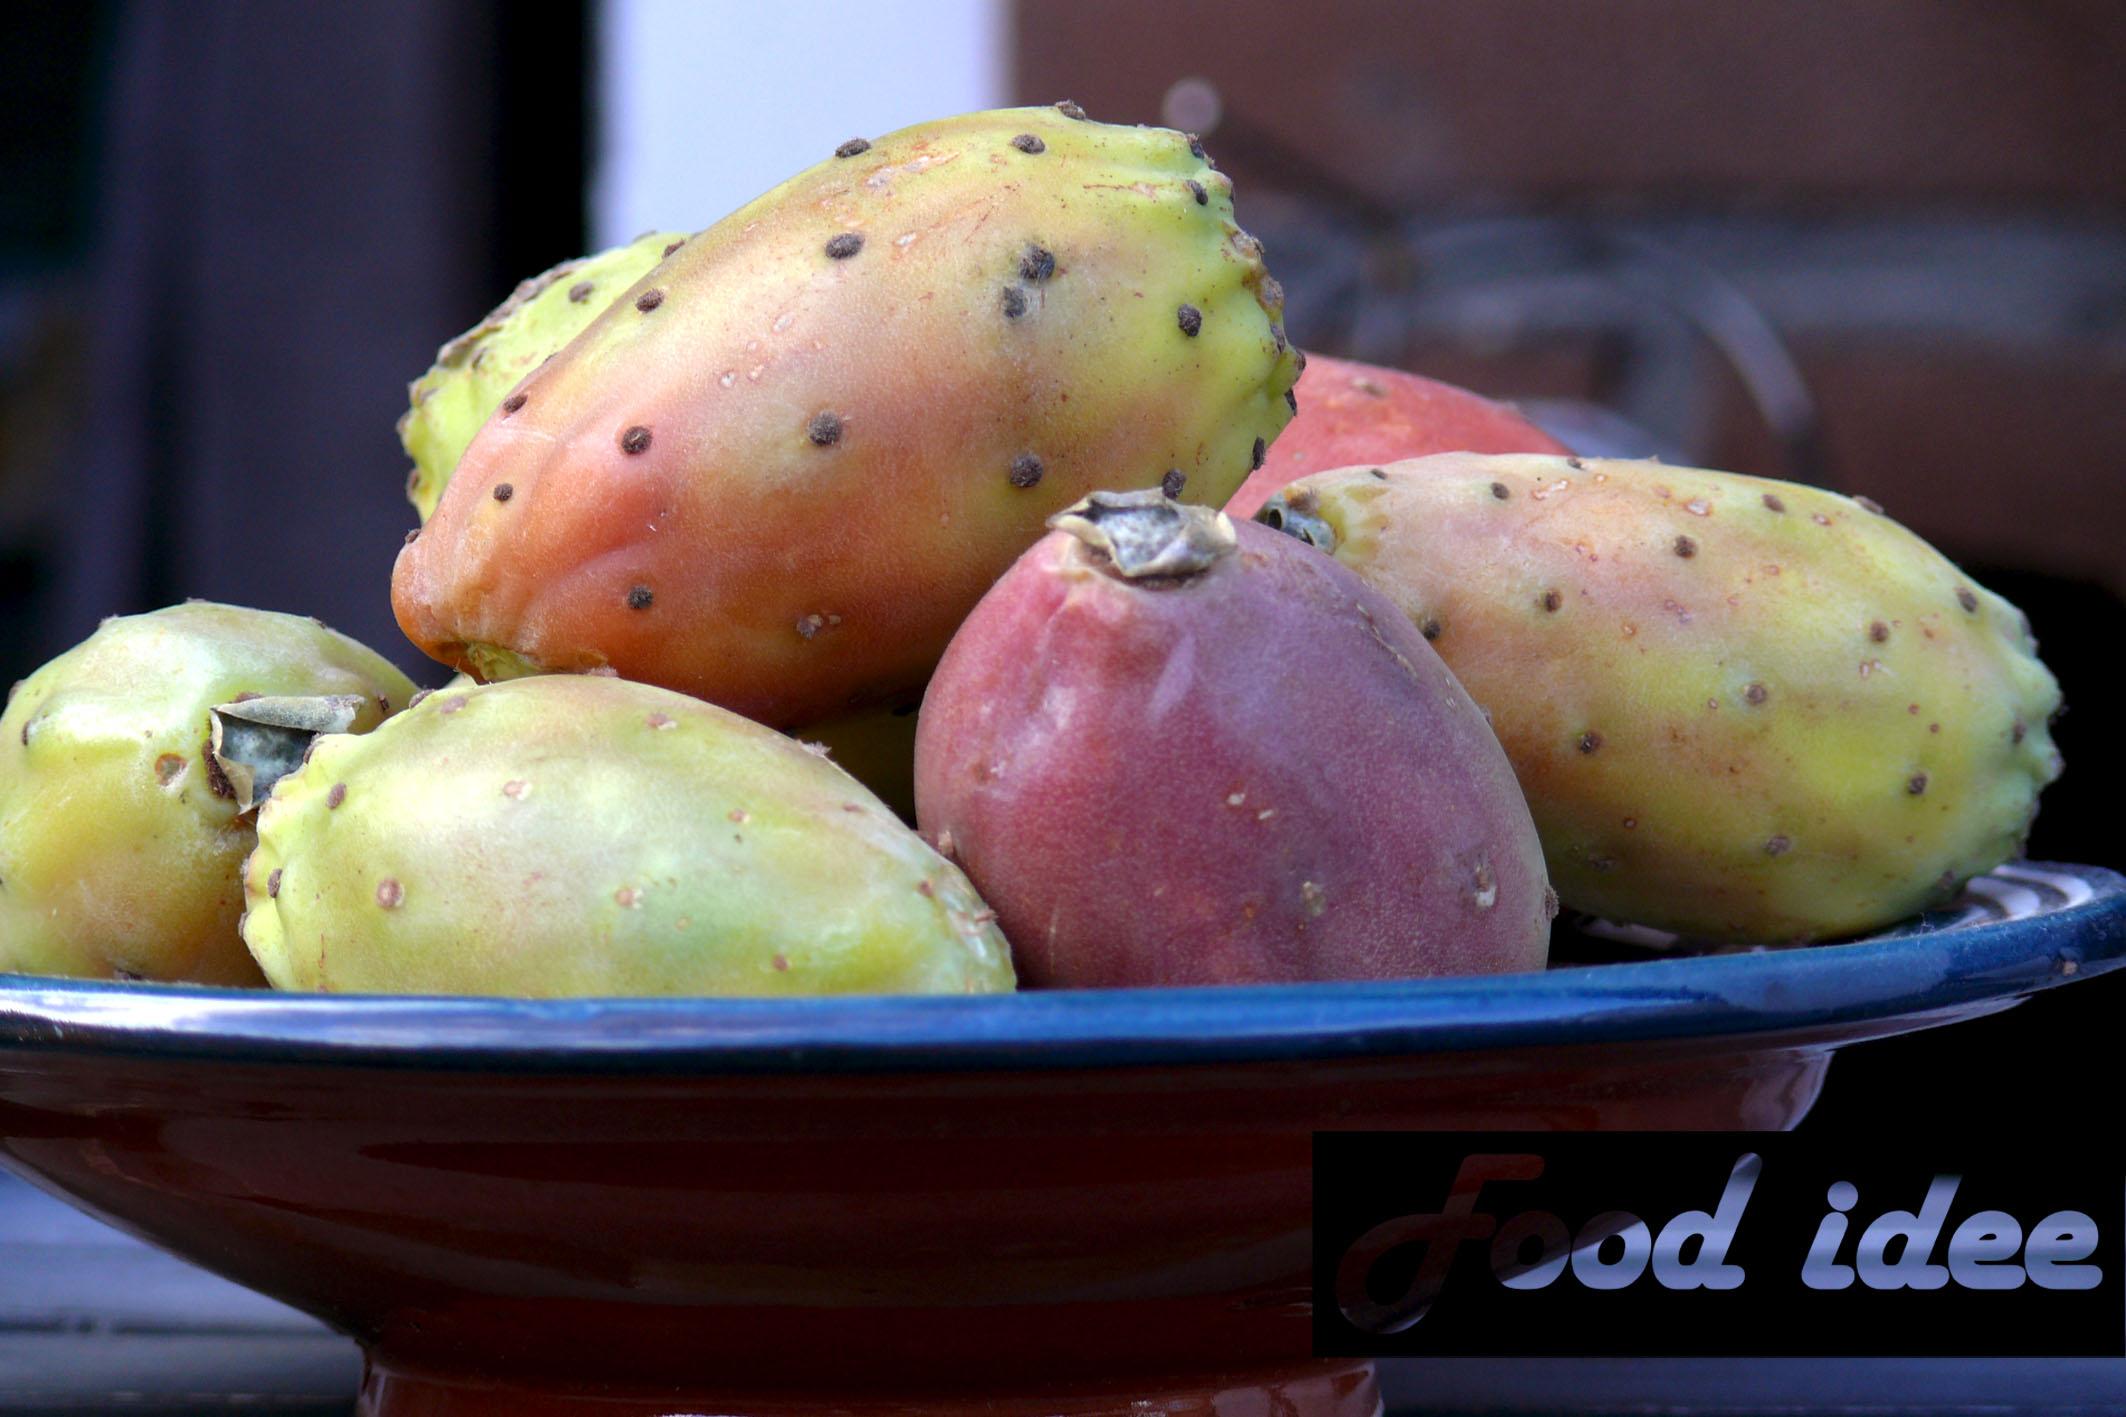 Cactusvijg: exotisch fruit